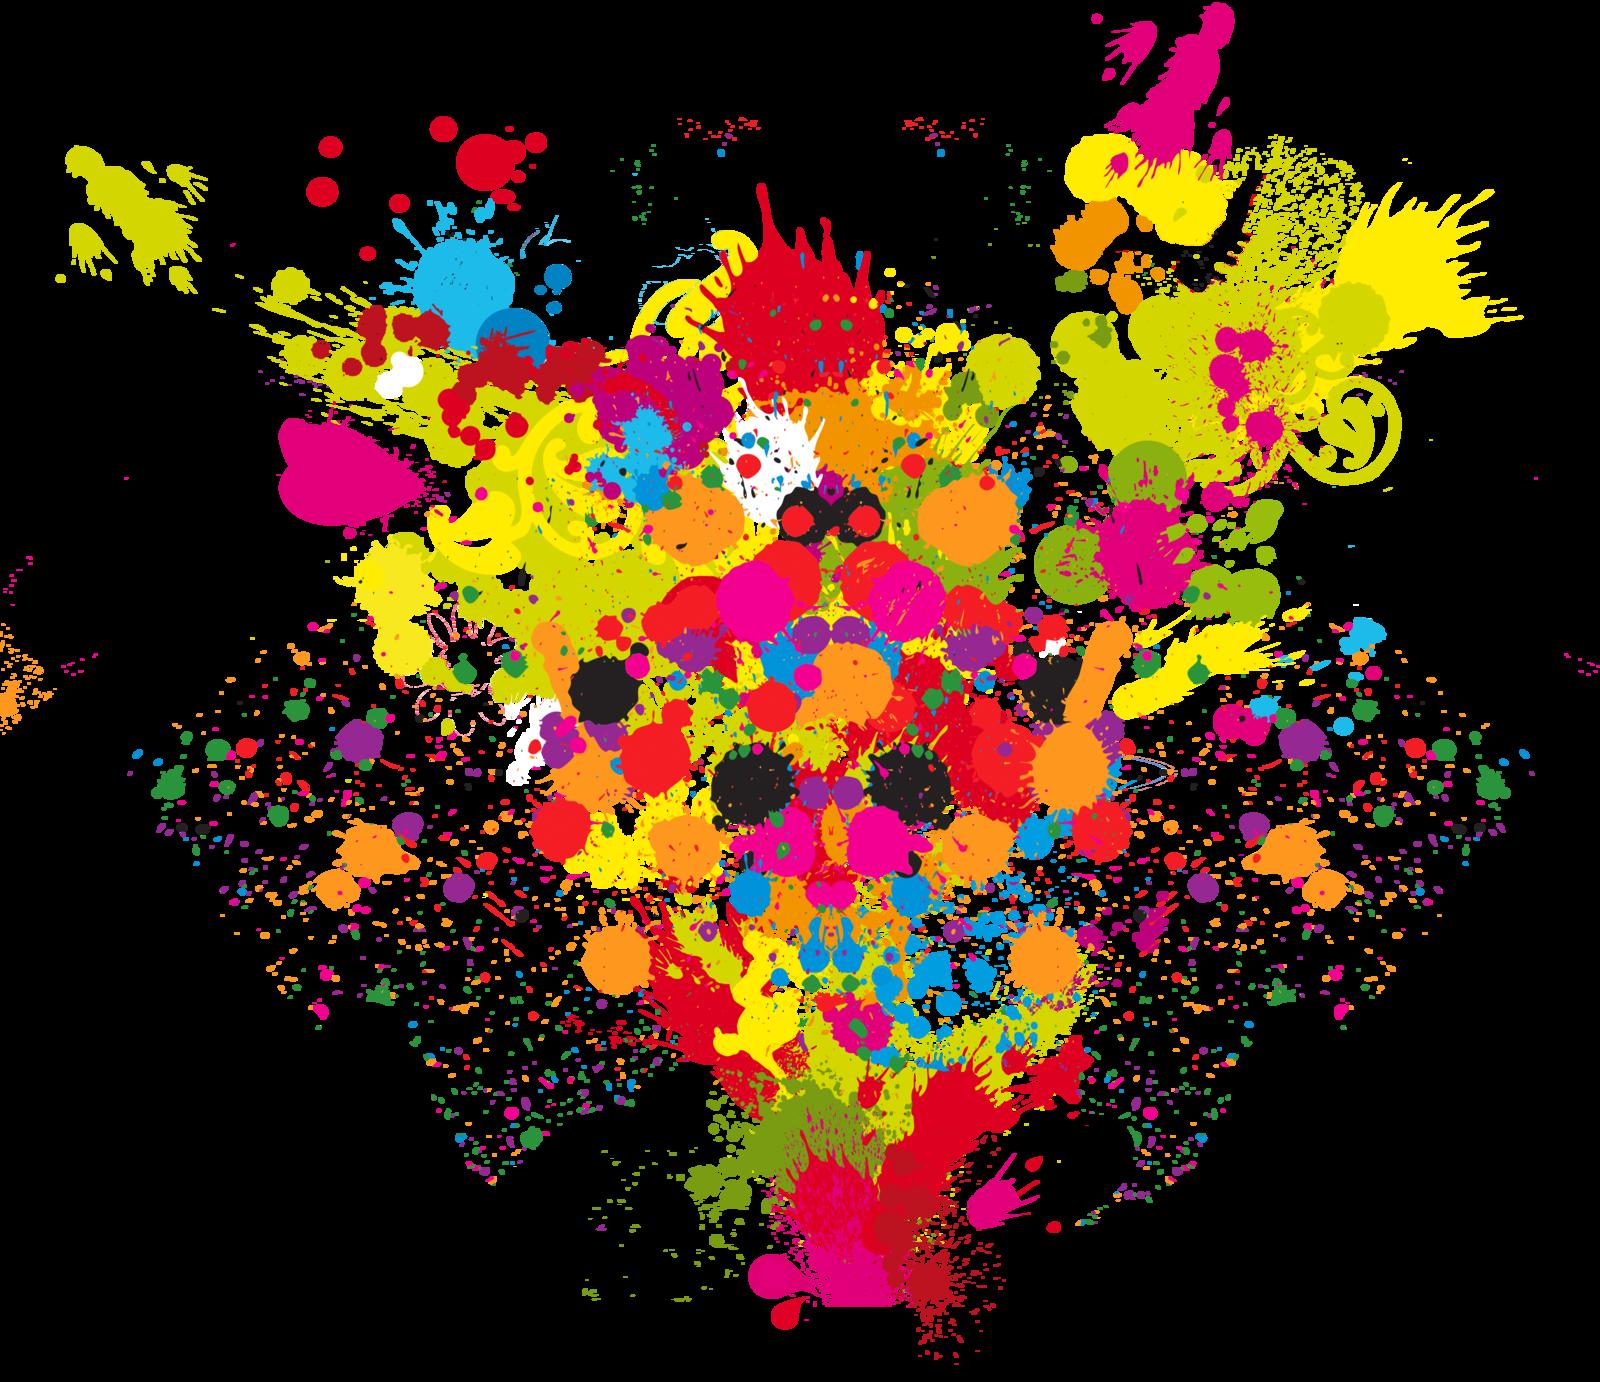 color-explosion-clipart-13